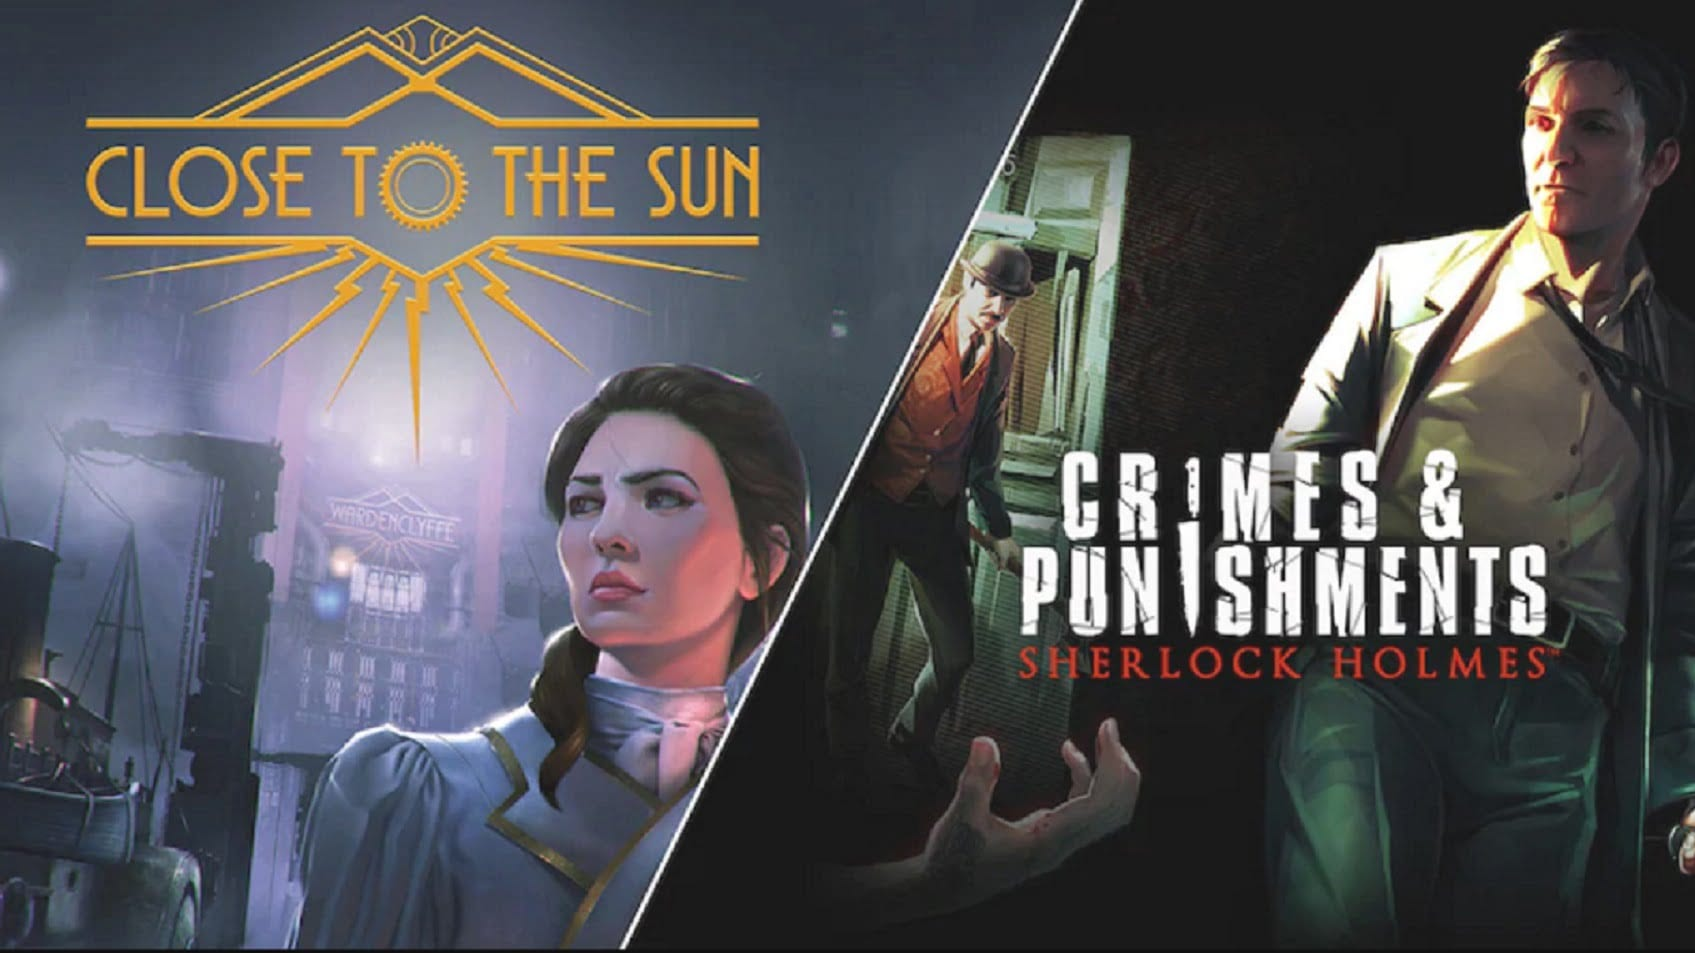 EGS набирает обороты: бесплатная раздача игр Close To The Sun и Sherlock Holmes: Crimes and Punishments